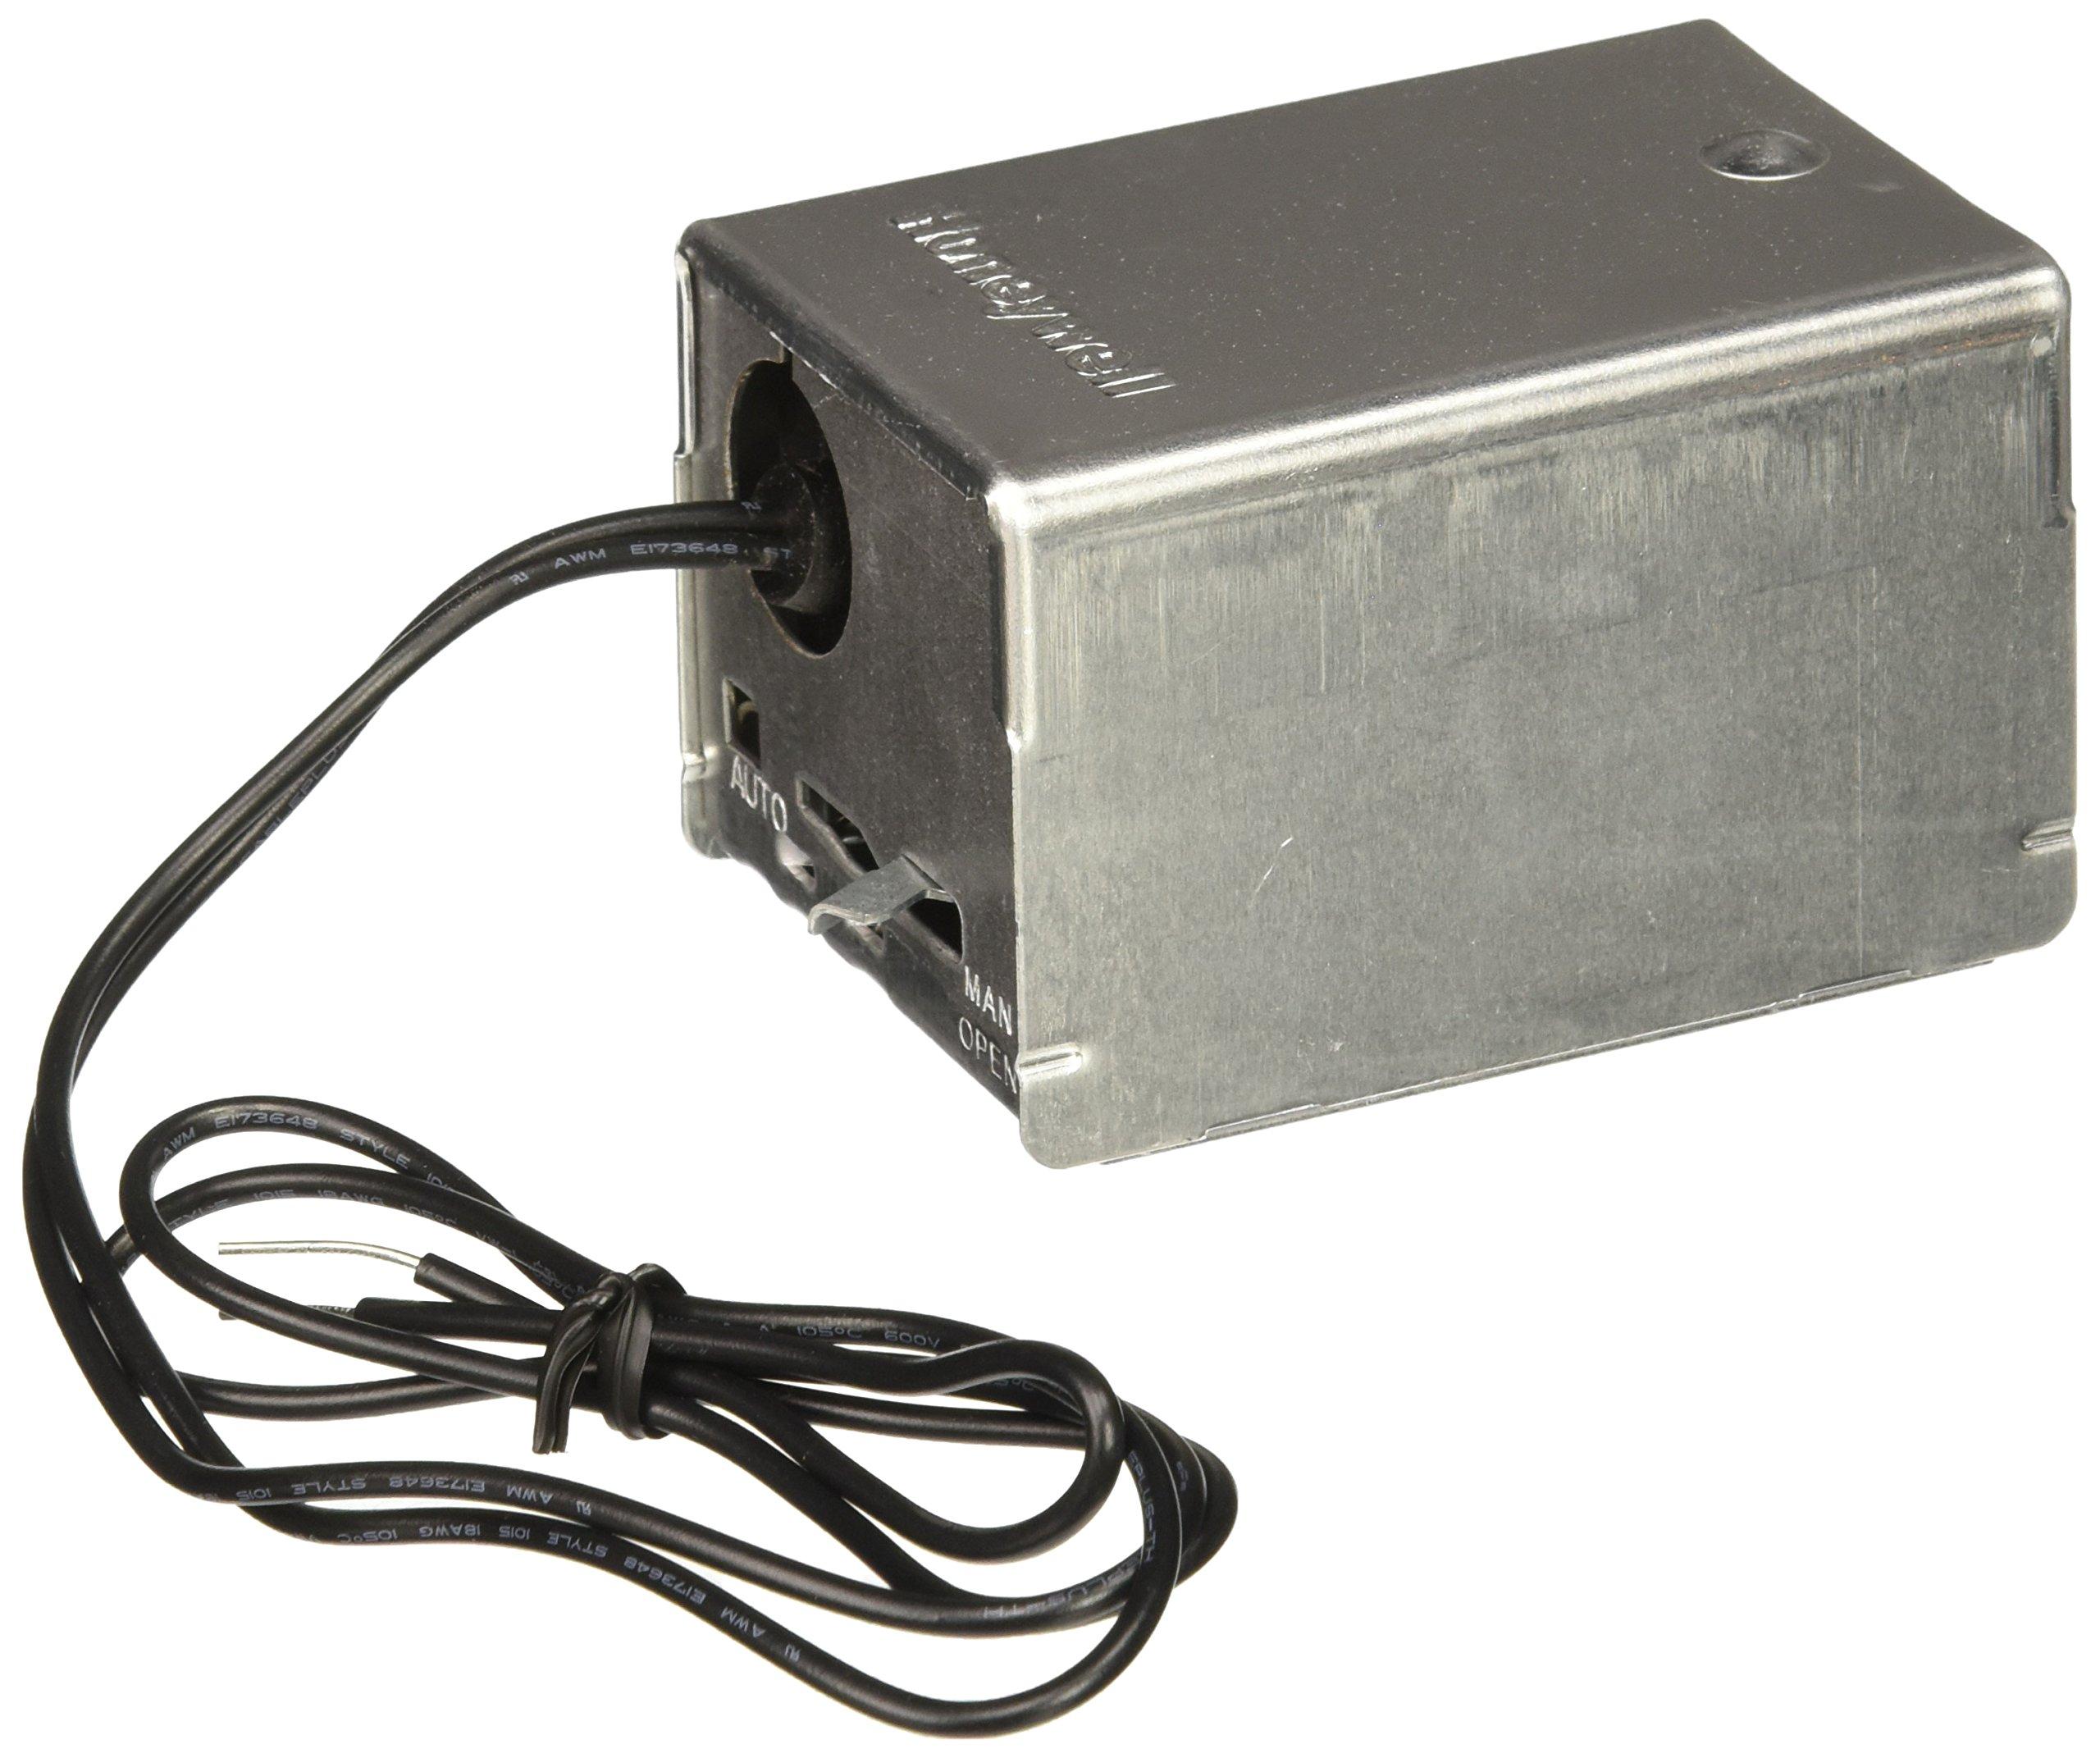 Honeywell 40003916-024 120V 2-Wire Power Head by Honeywell